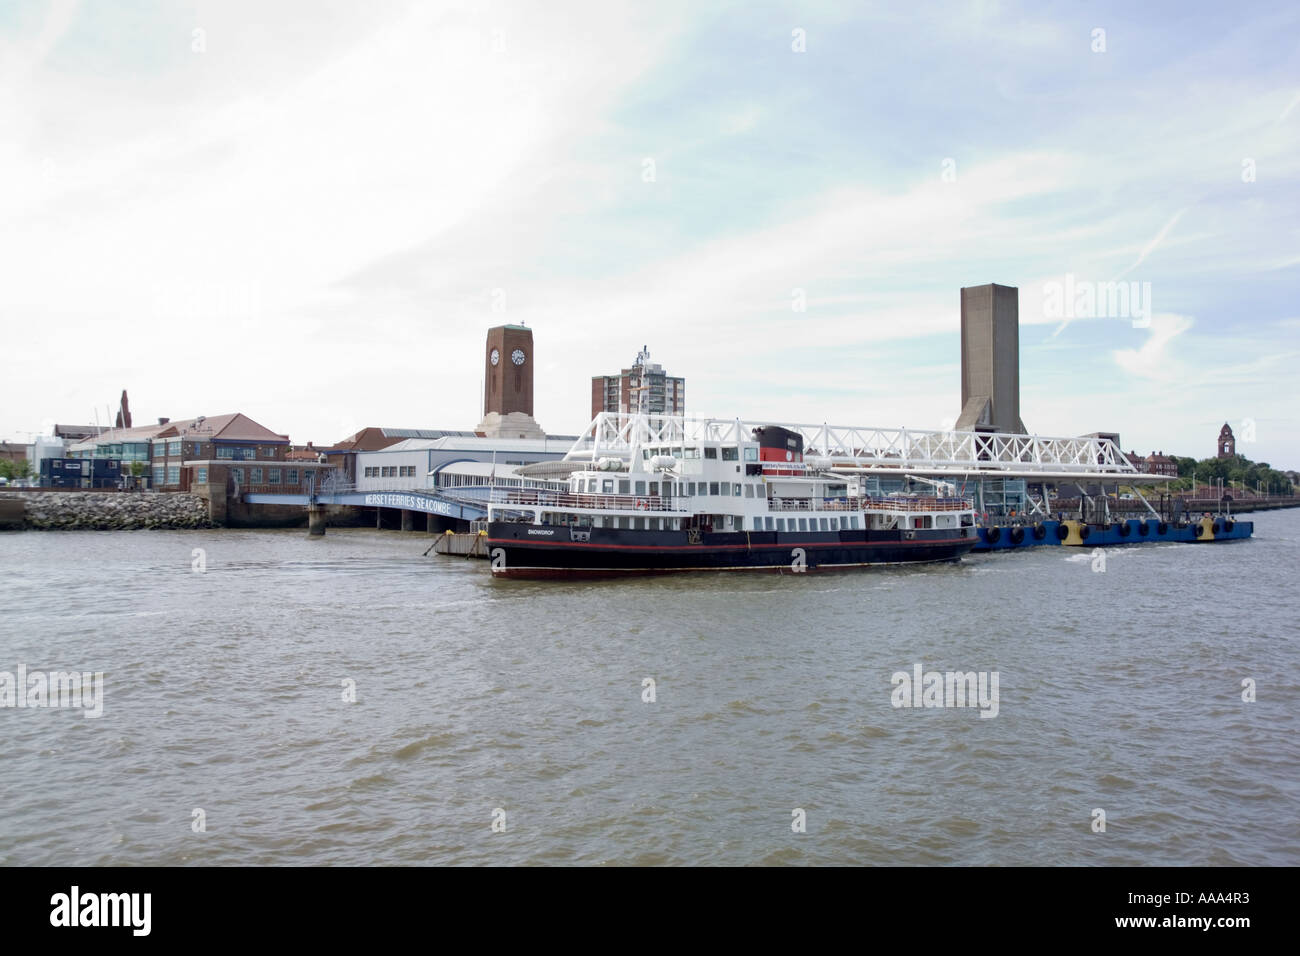 Seacombe Mersey Ferries passenger Terminal,Wirral,Birkenhead,Liverpool,UK,GB,England, - Stock Image